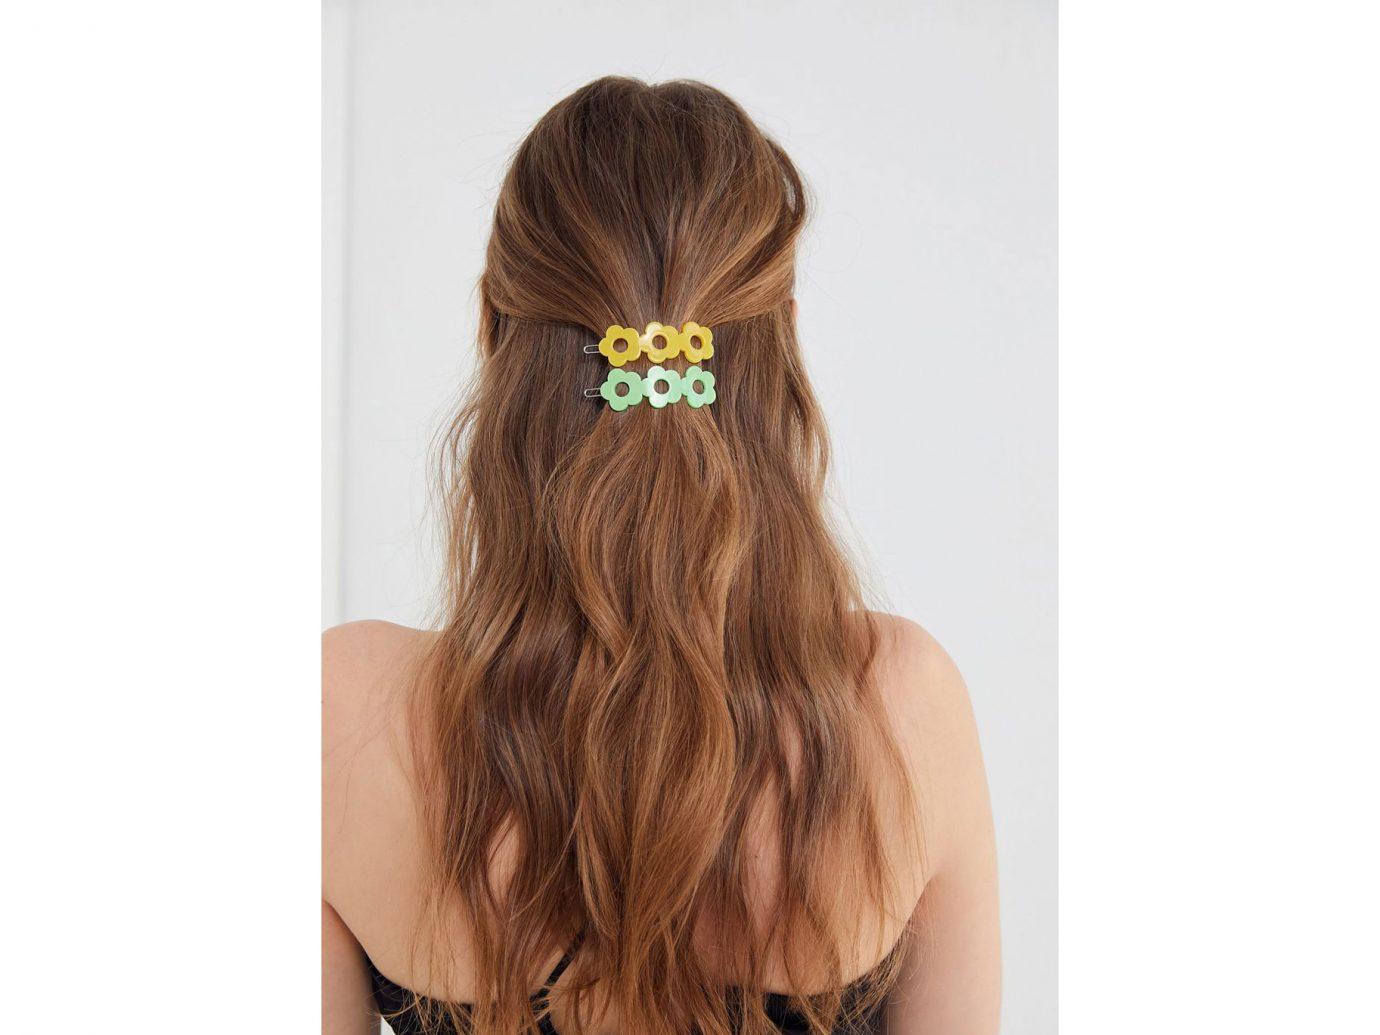 Urban outfitters Daisy Hair Clip Set